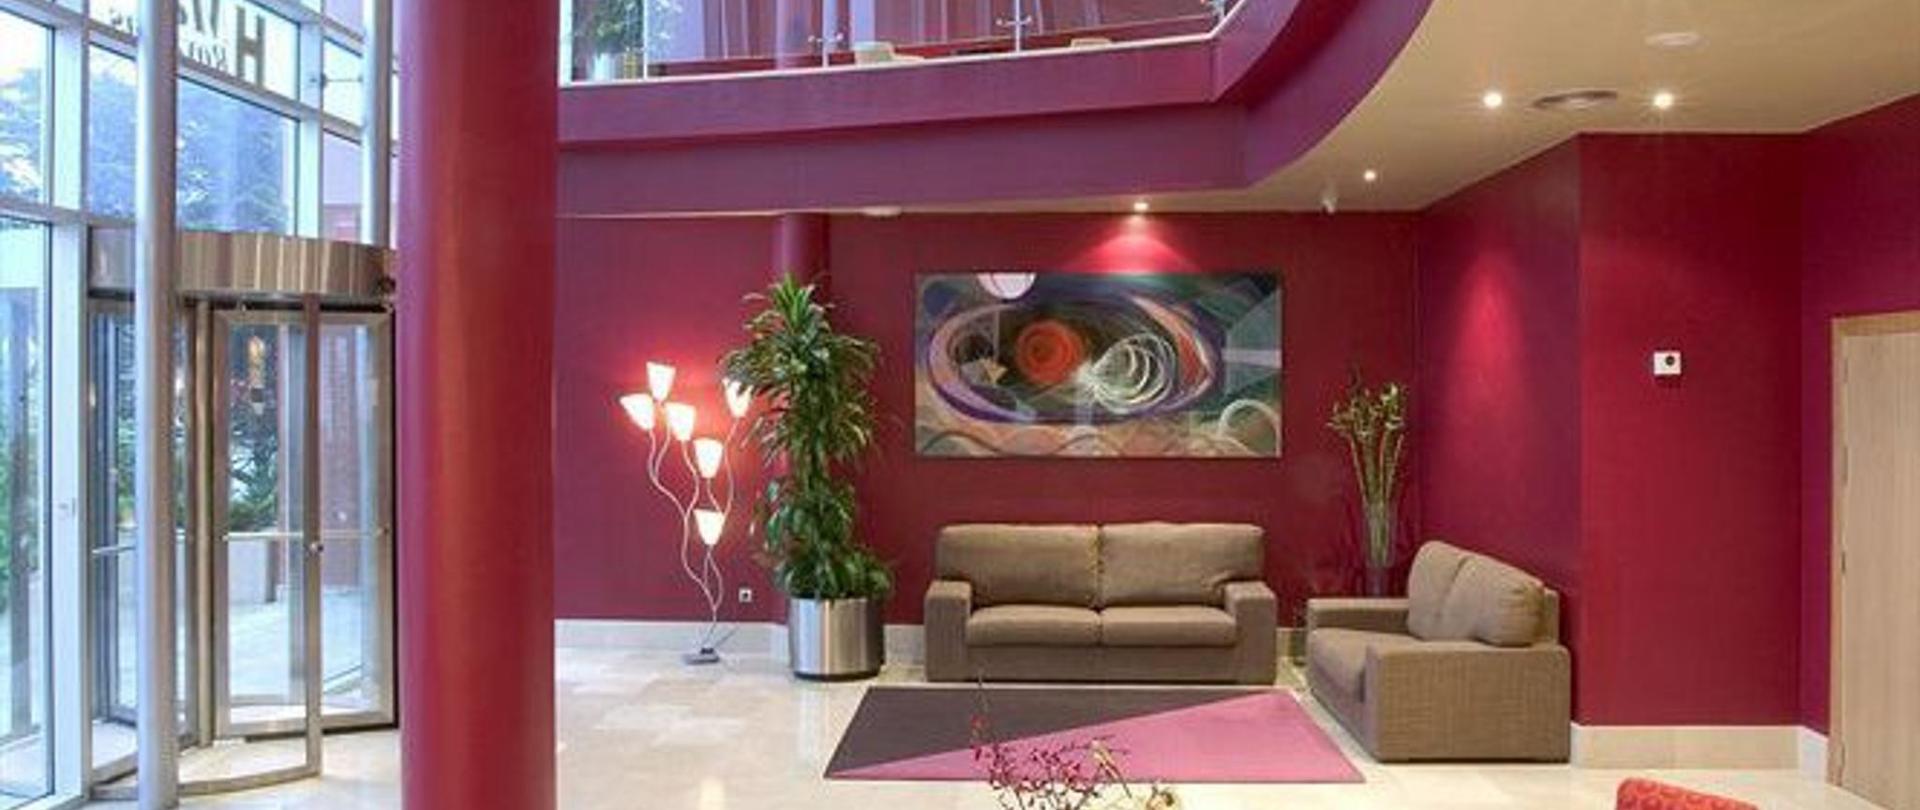 hotel-mar-comillas-027.jpg